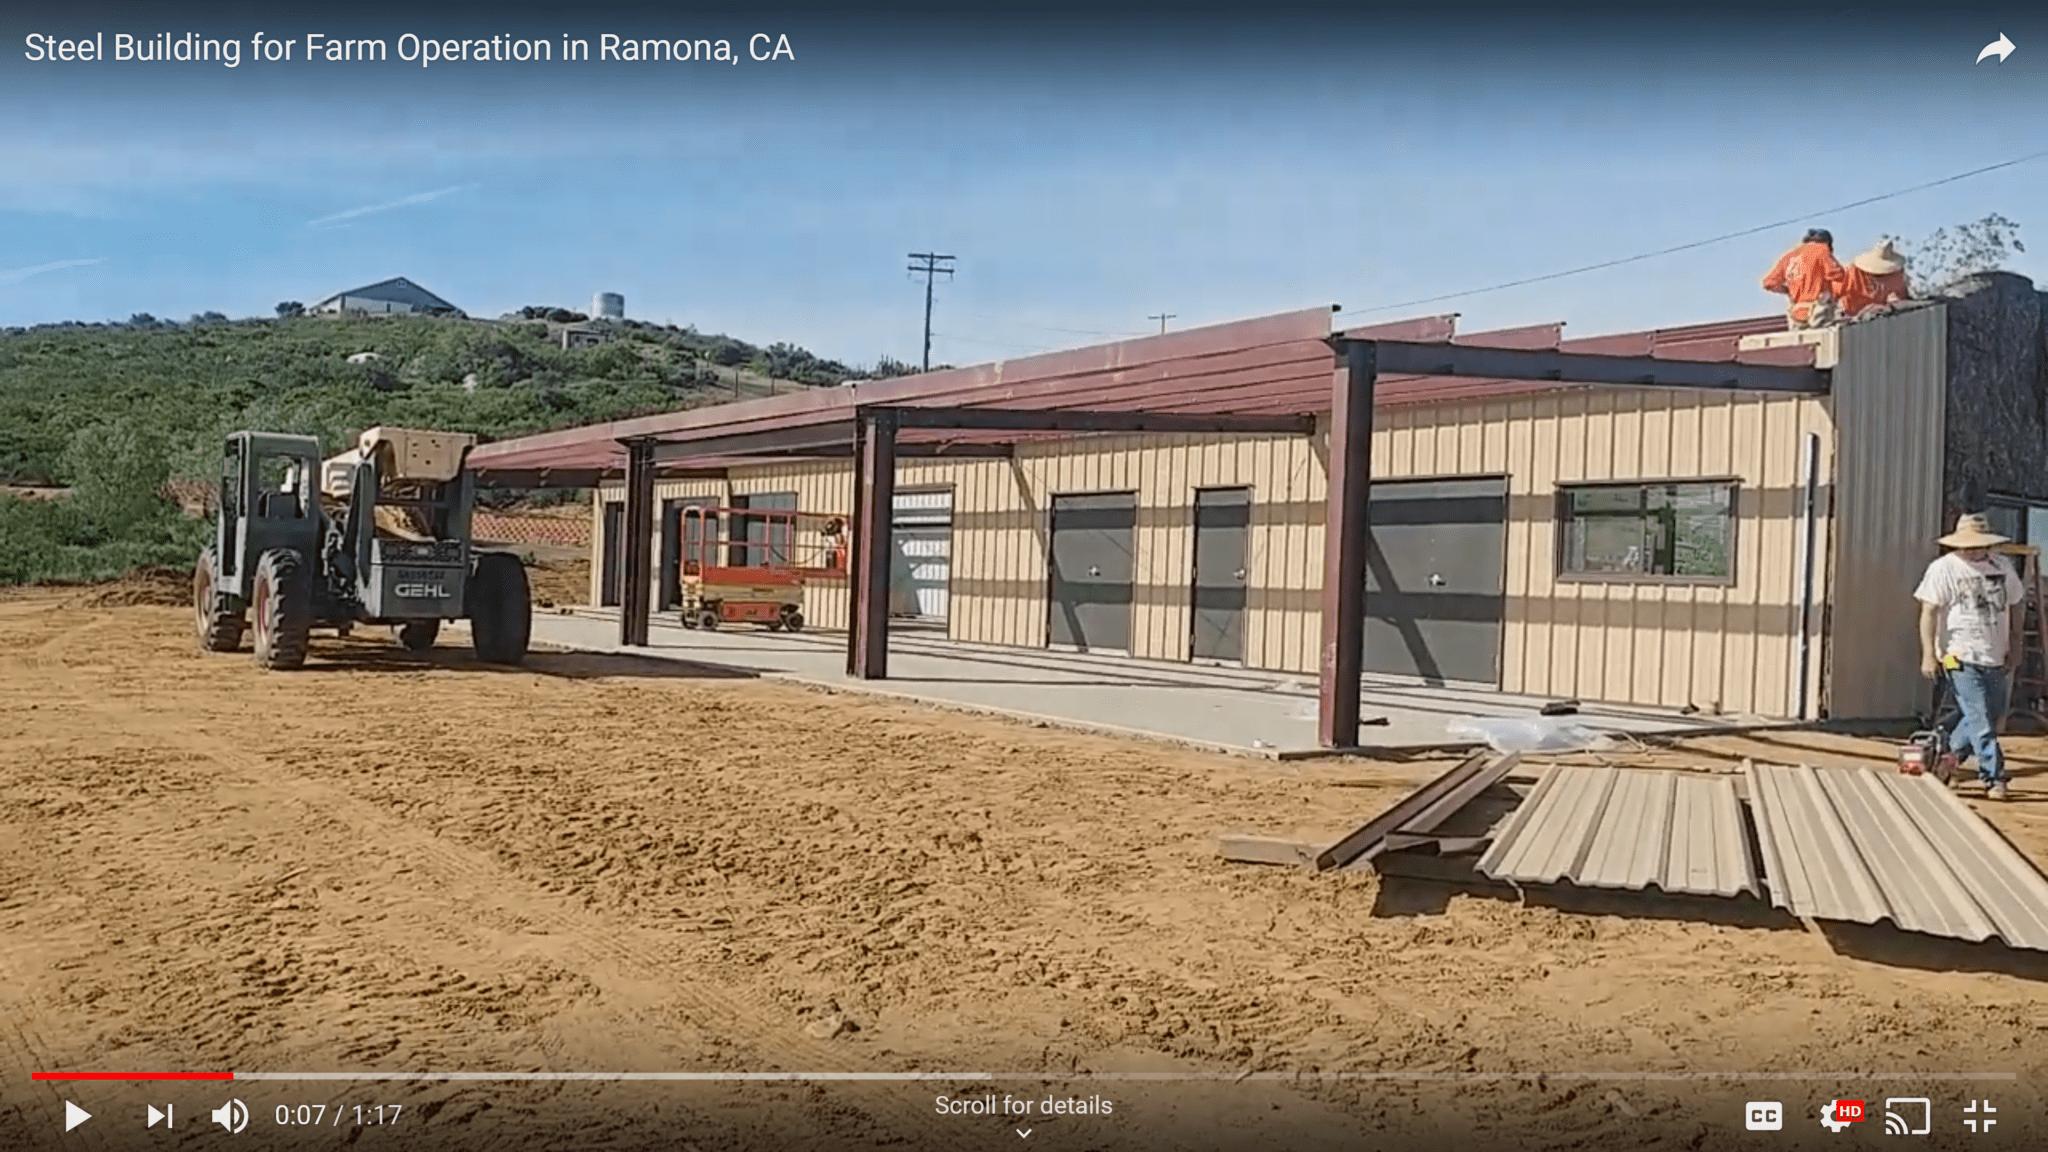 Steel-Building-for-Farm-in-Ramona-CA